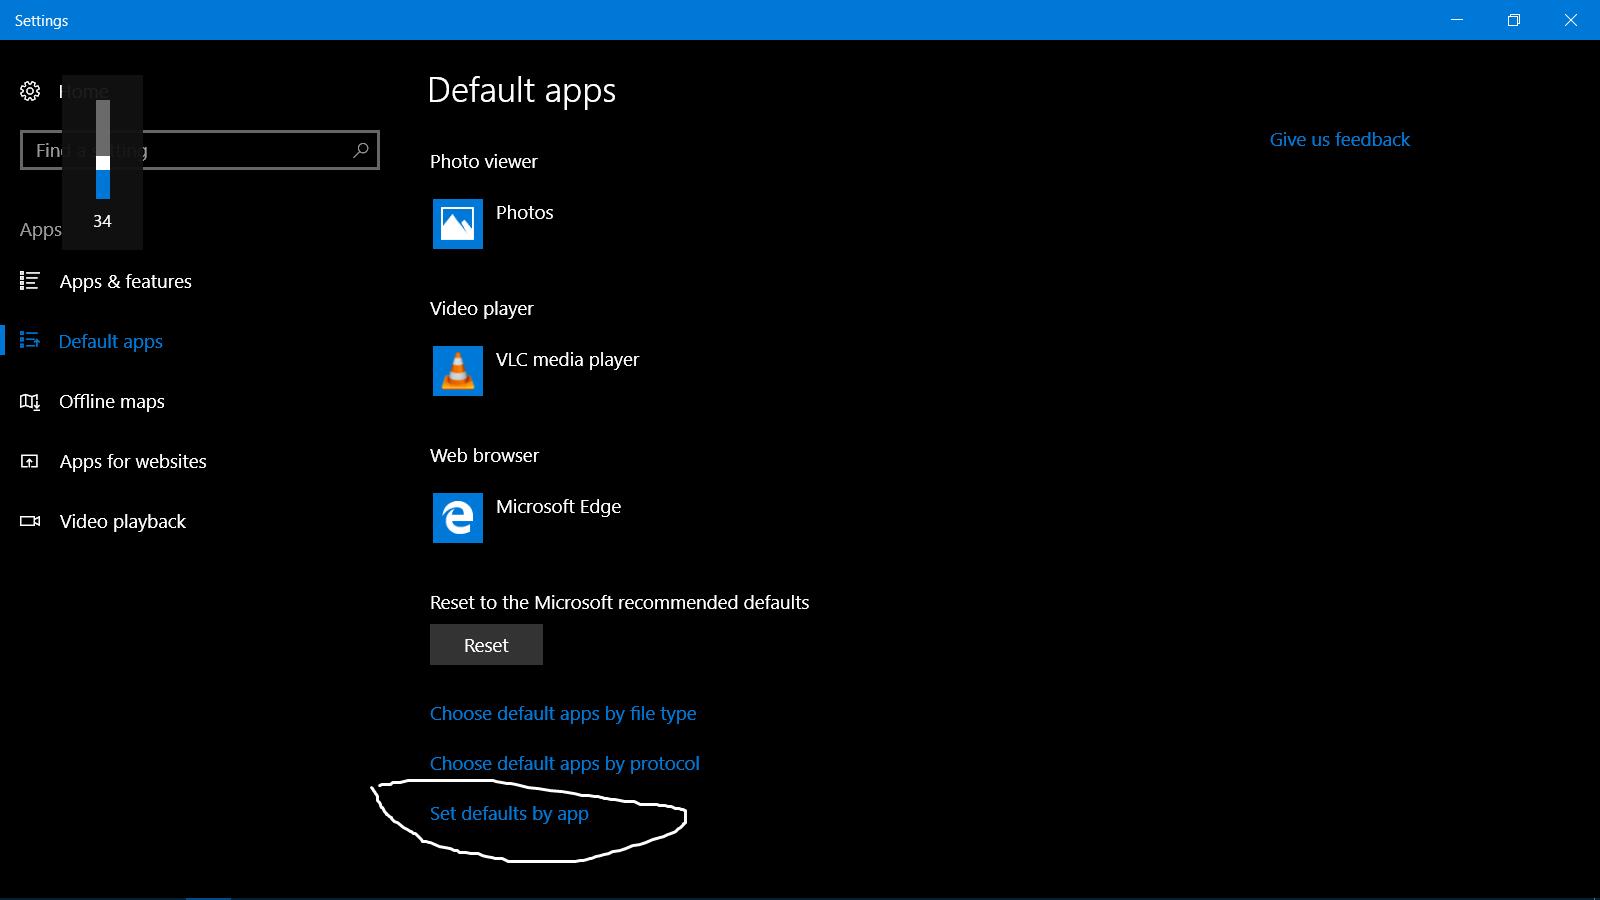 Winzip denies everything - Microsoft Community